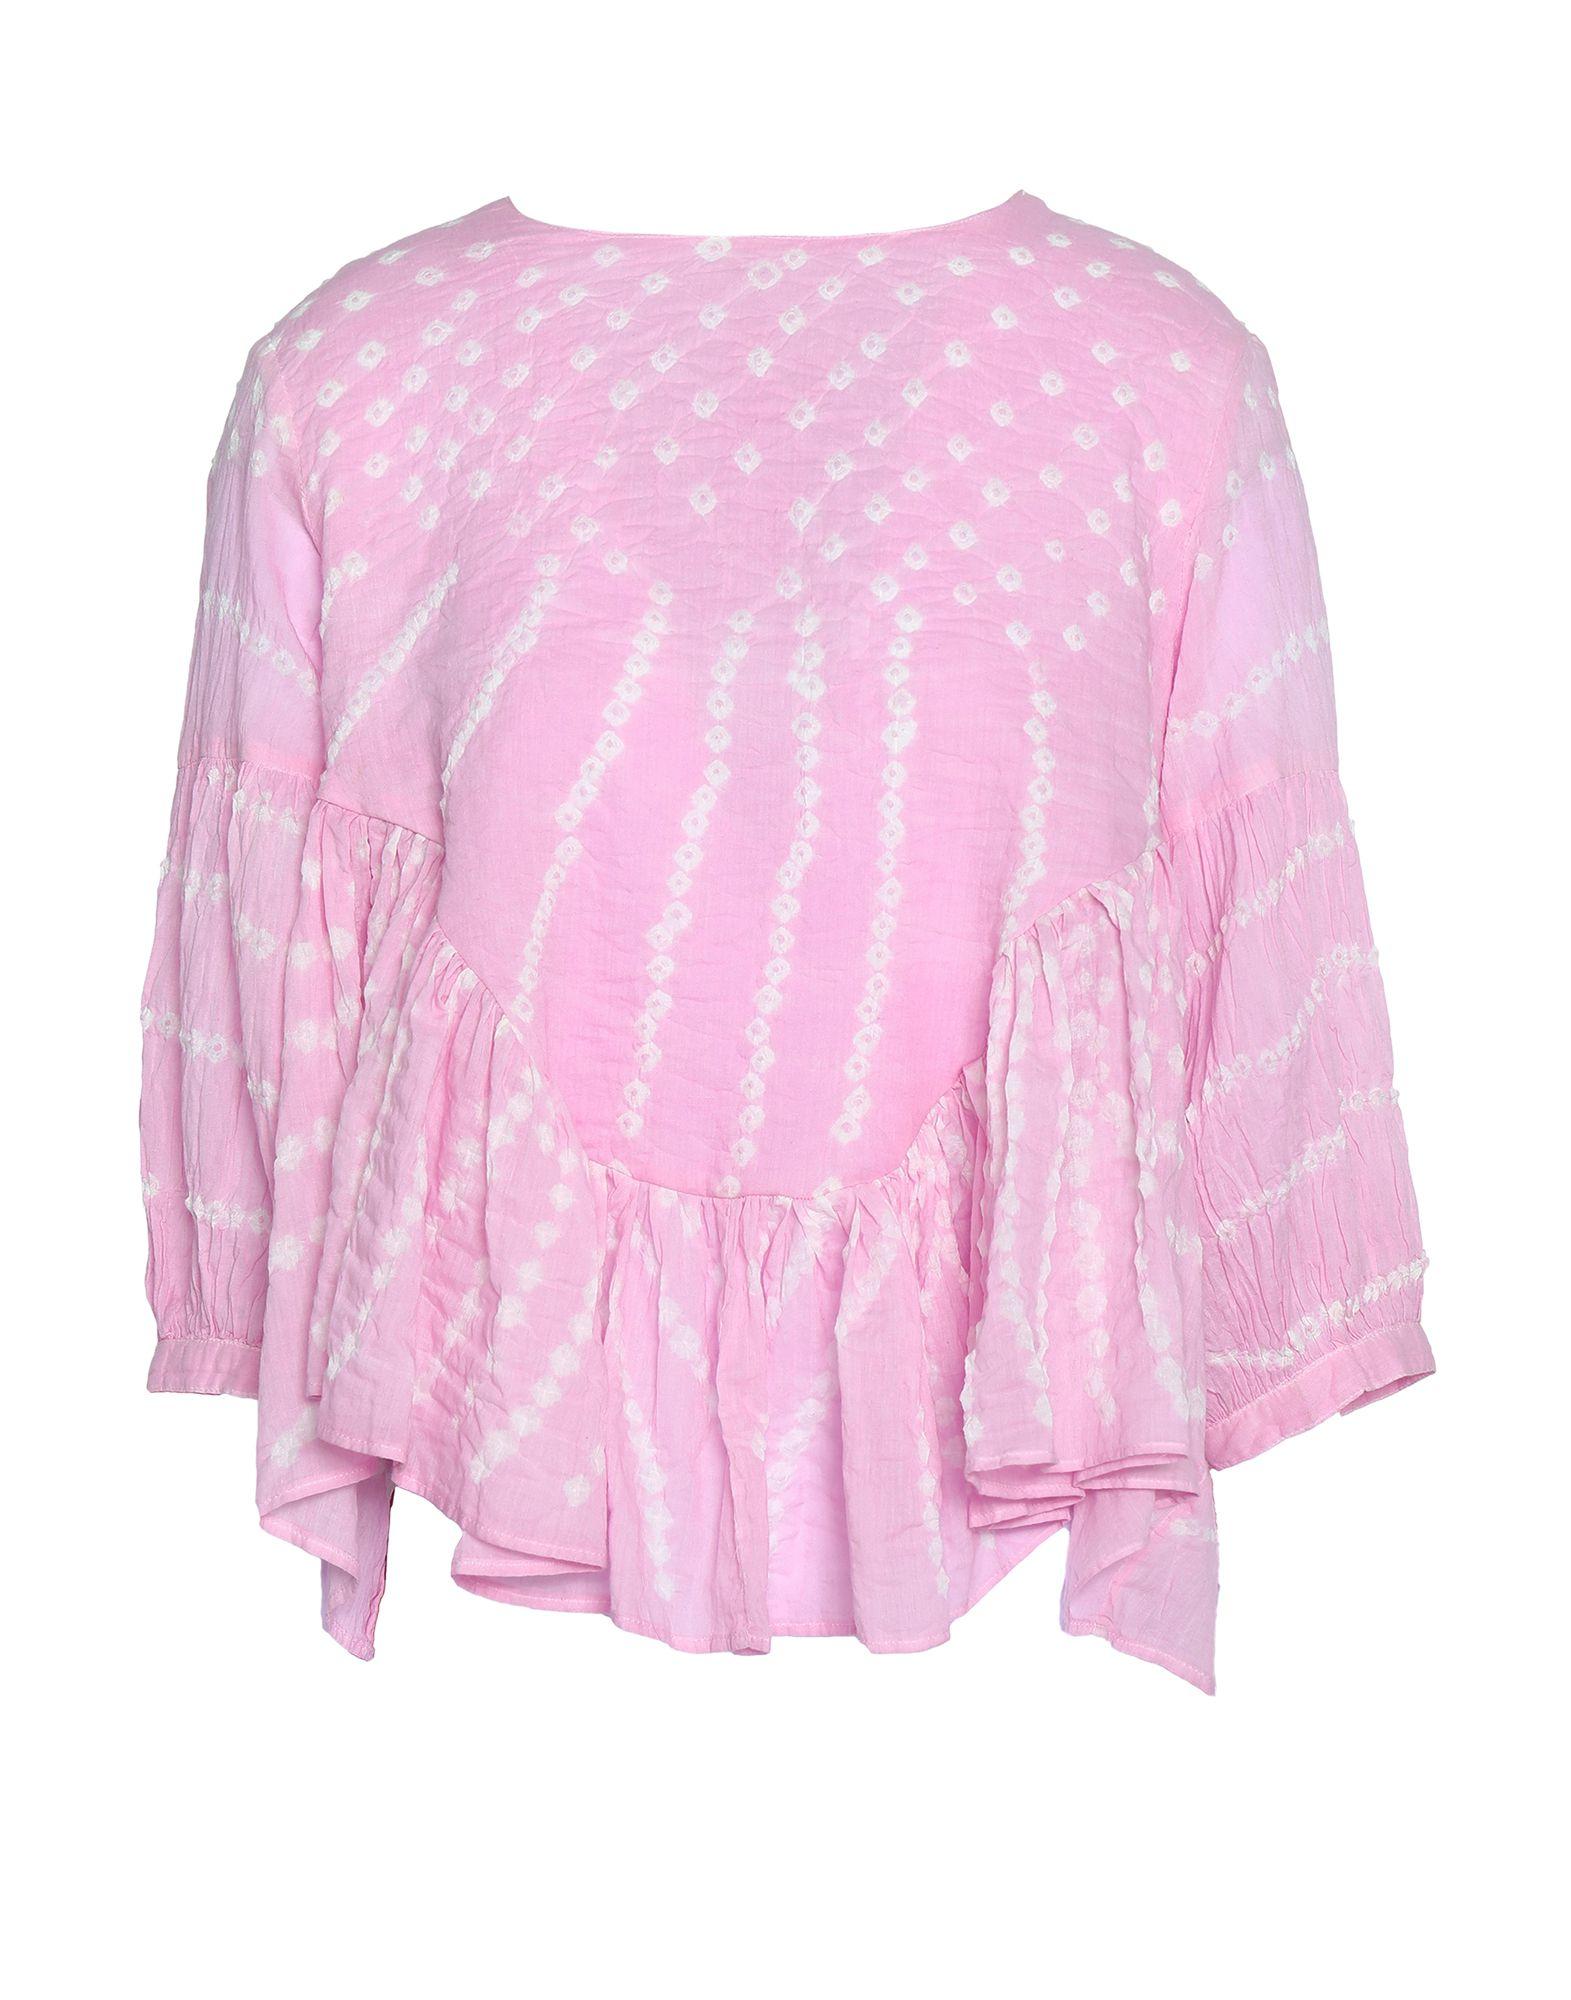 ANTIK BATIK Блузка batik batik плащ бонита красный